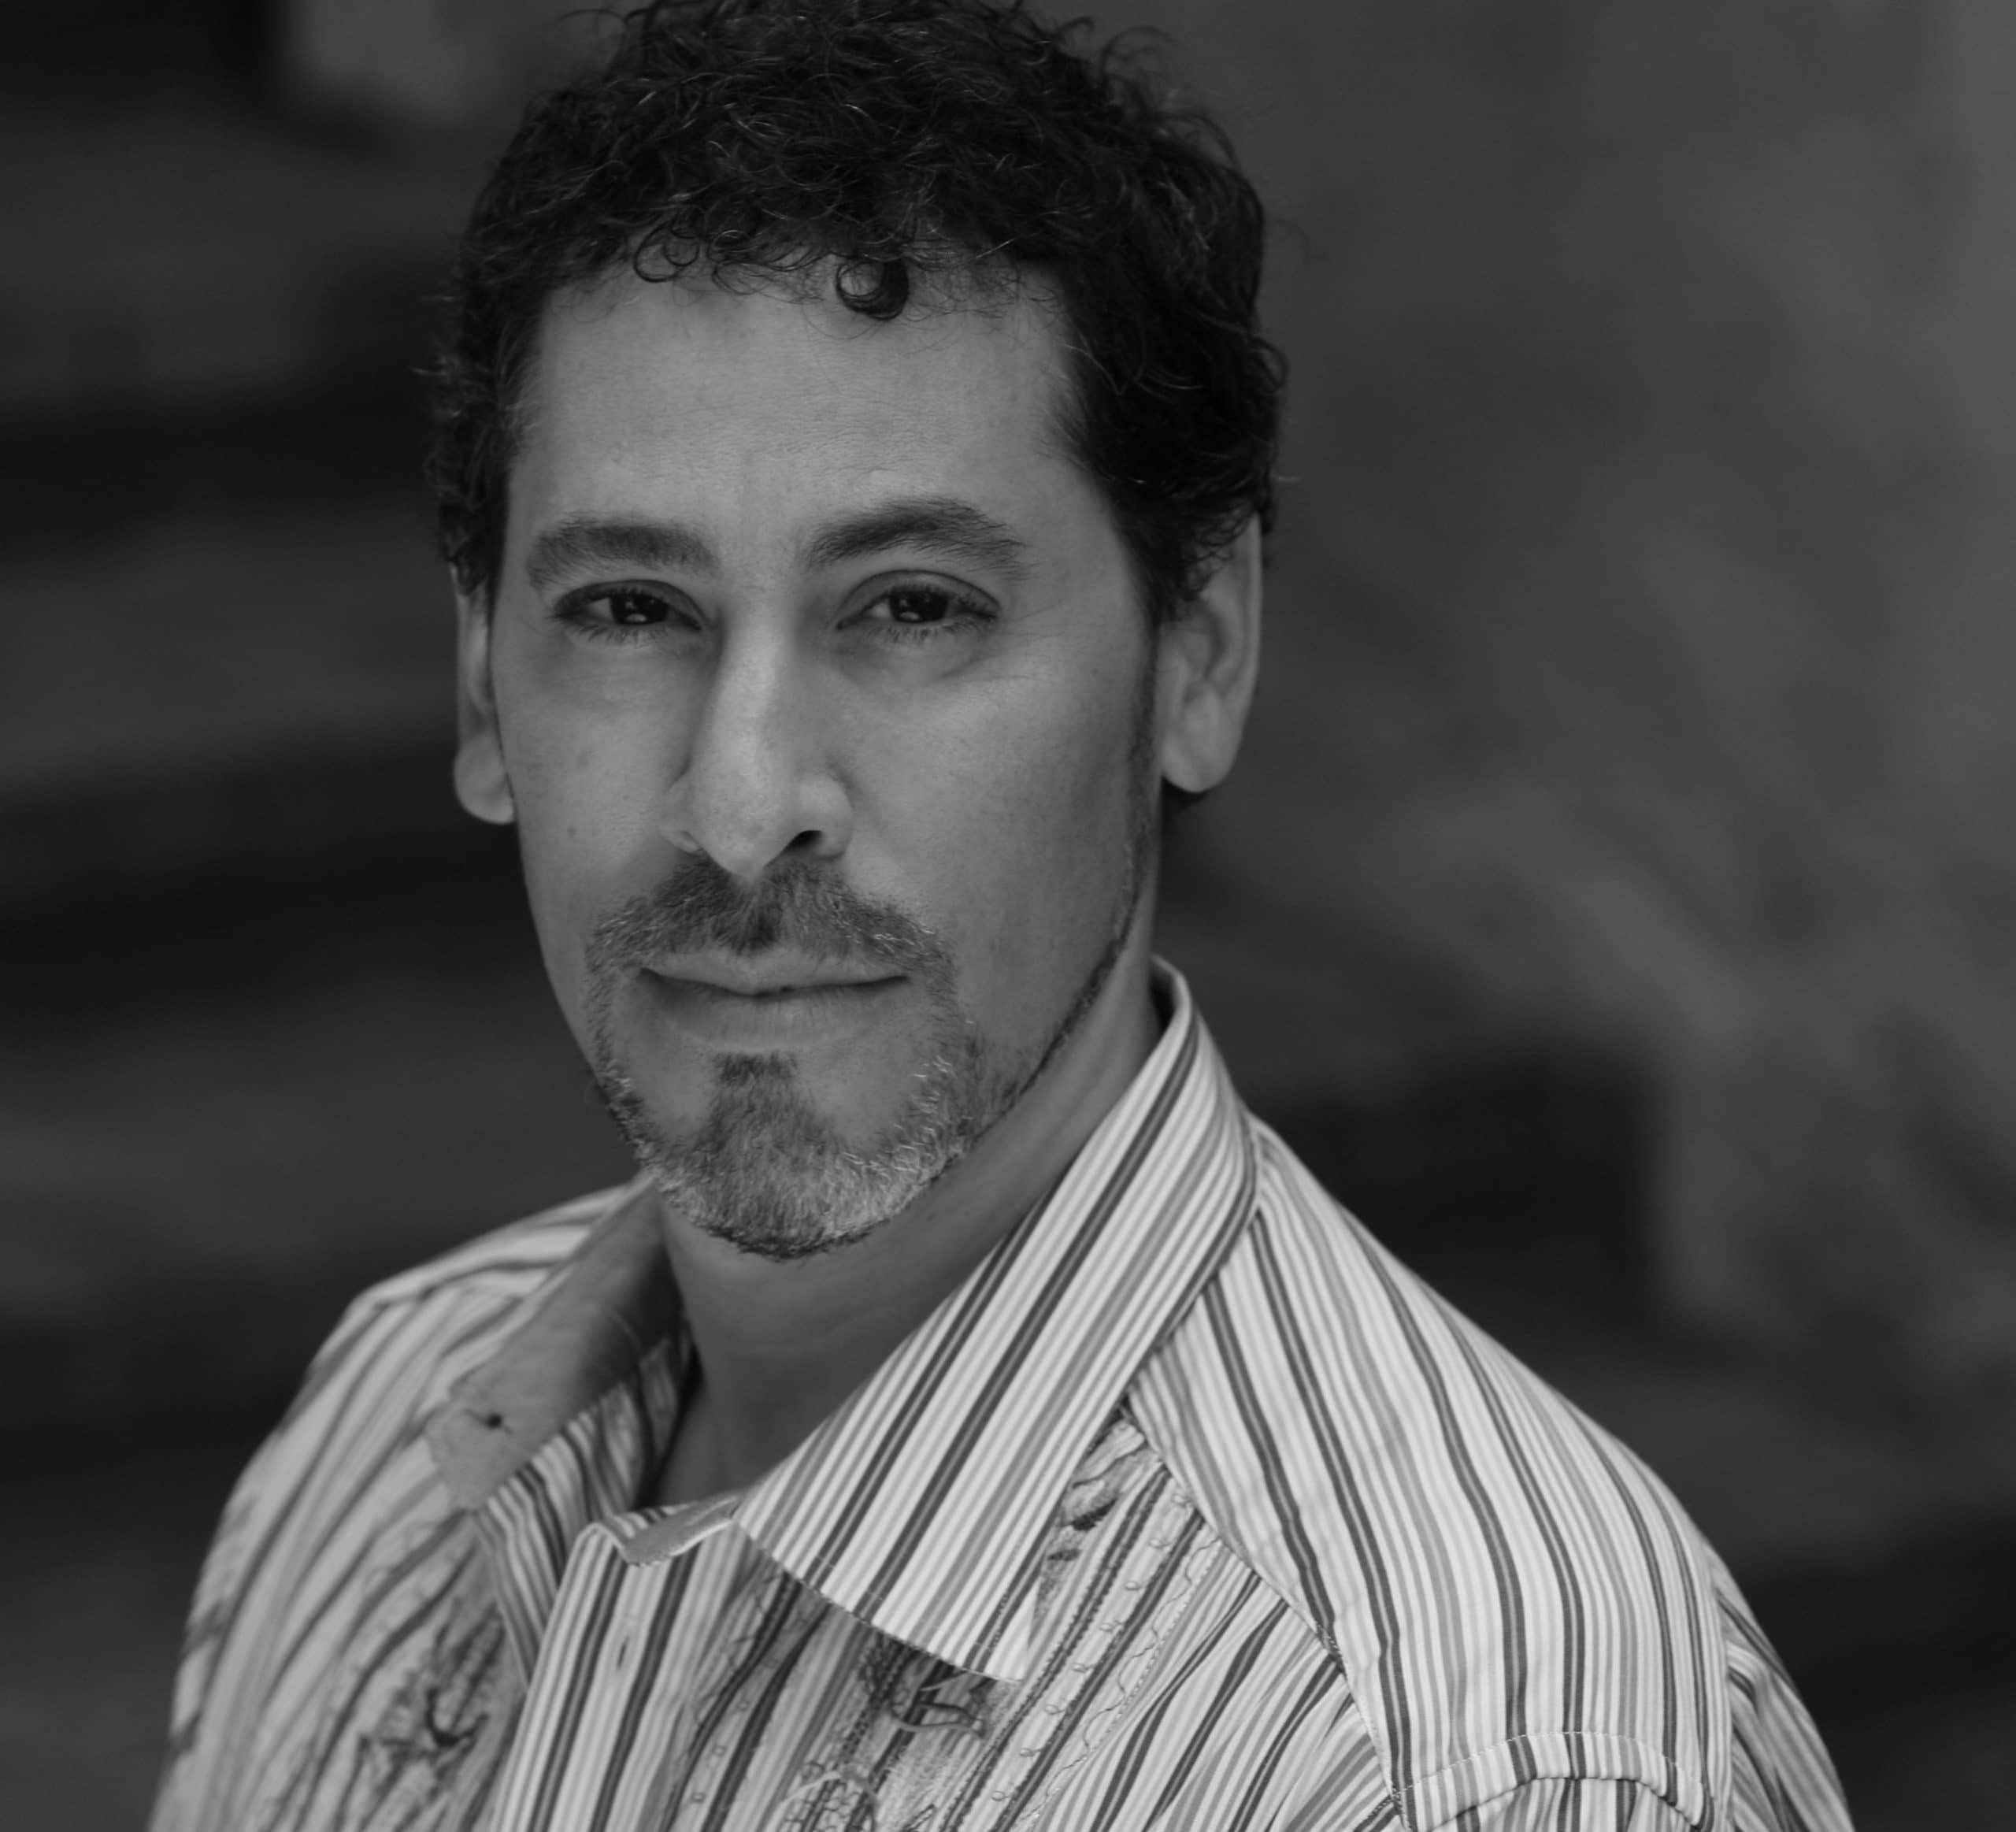 David Coffin American Actor, Producer